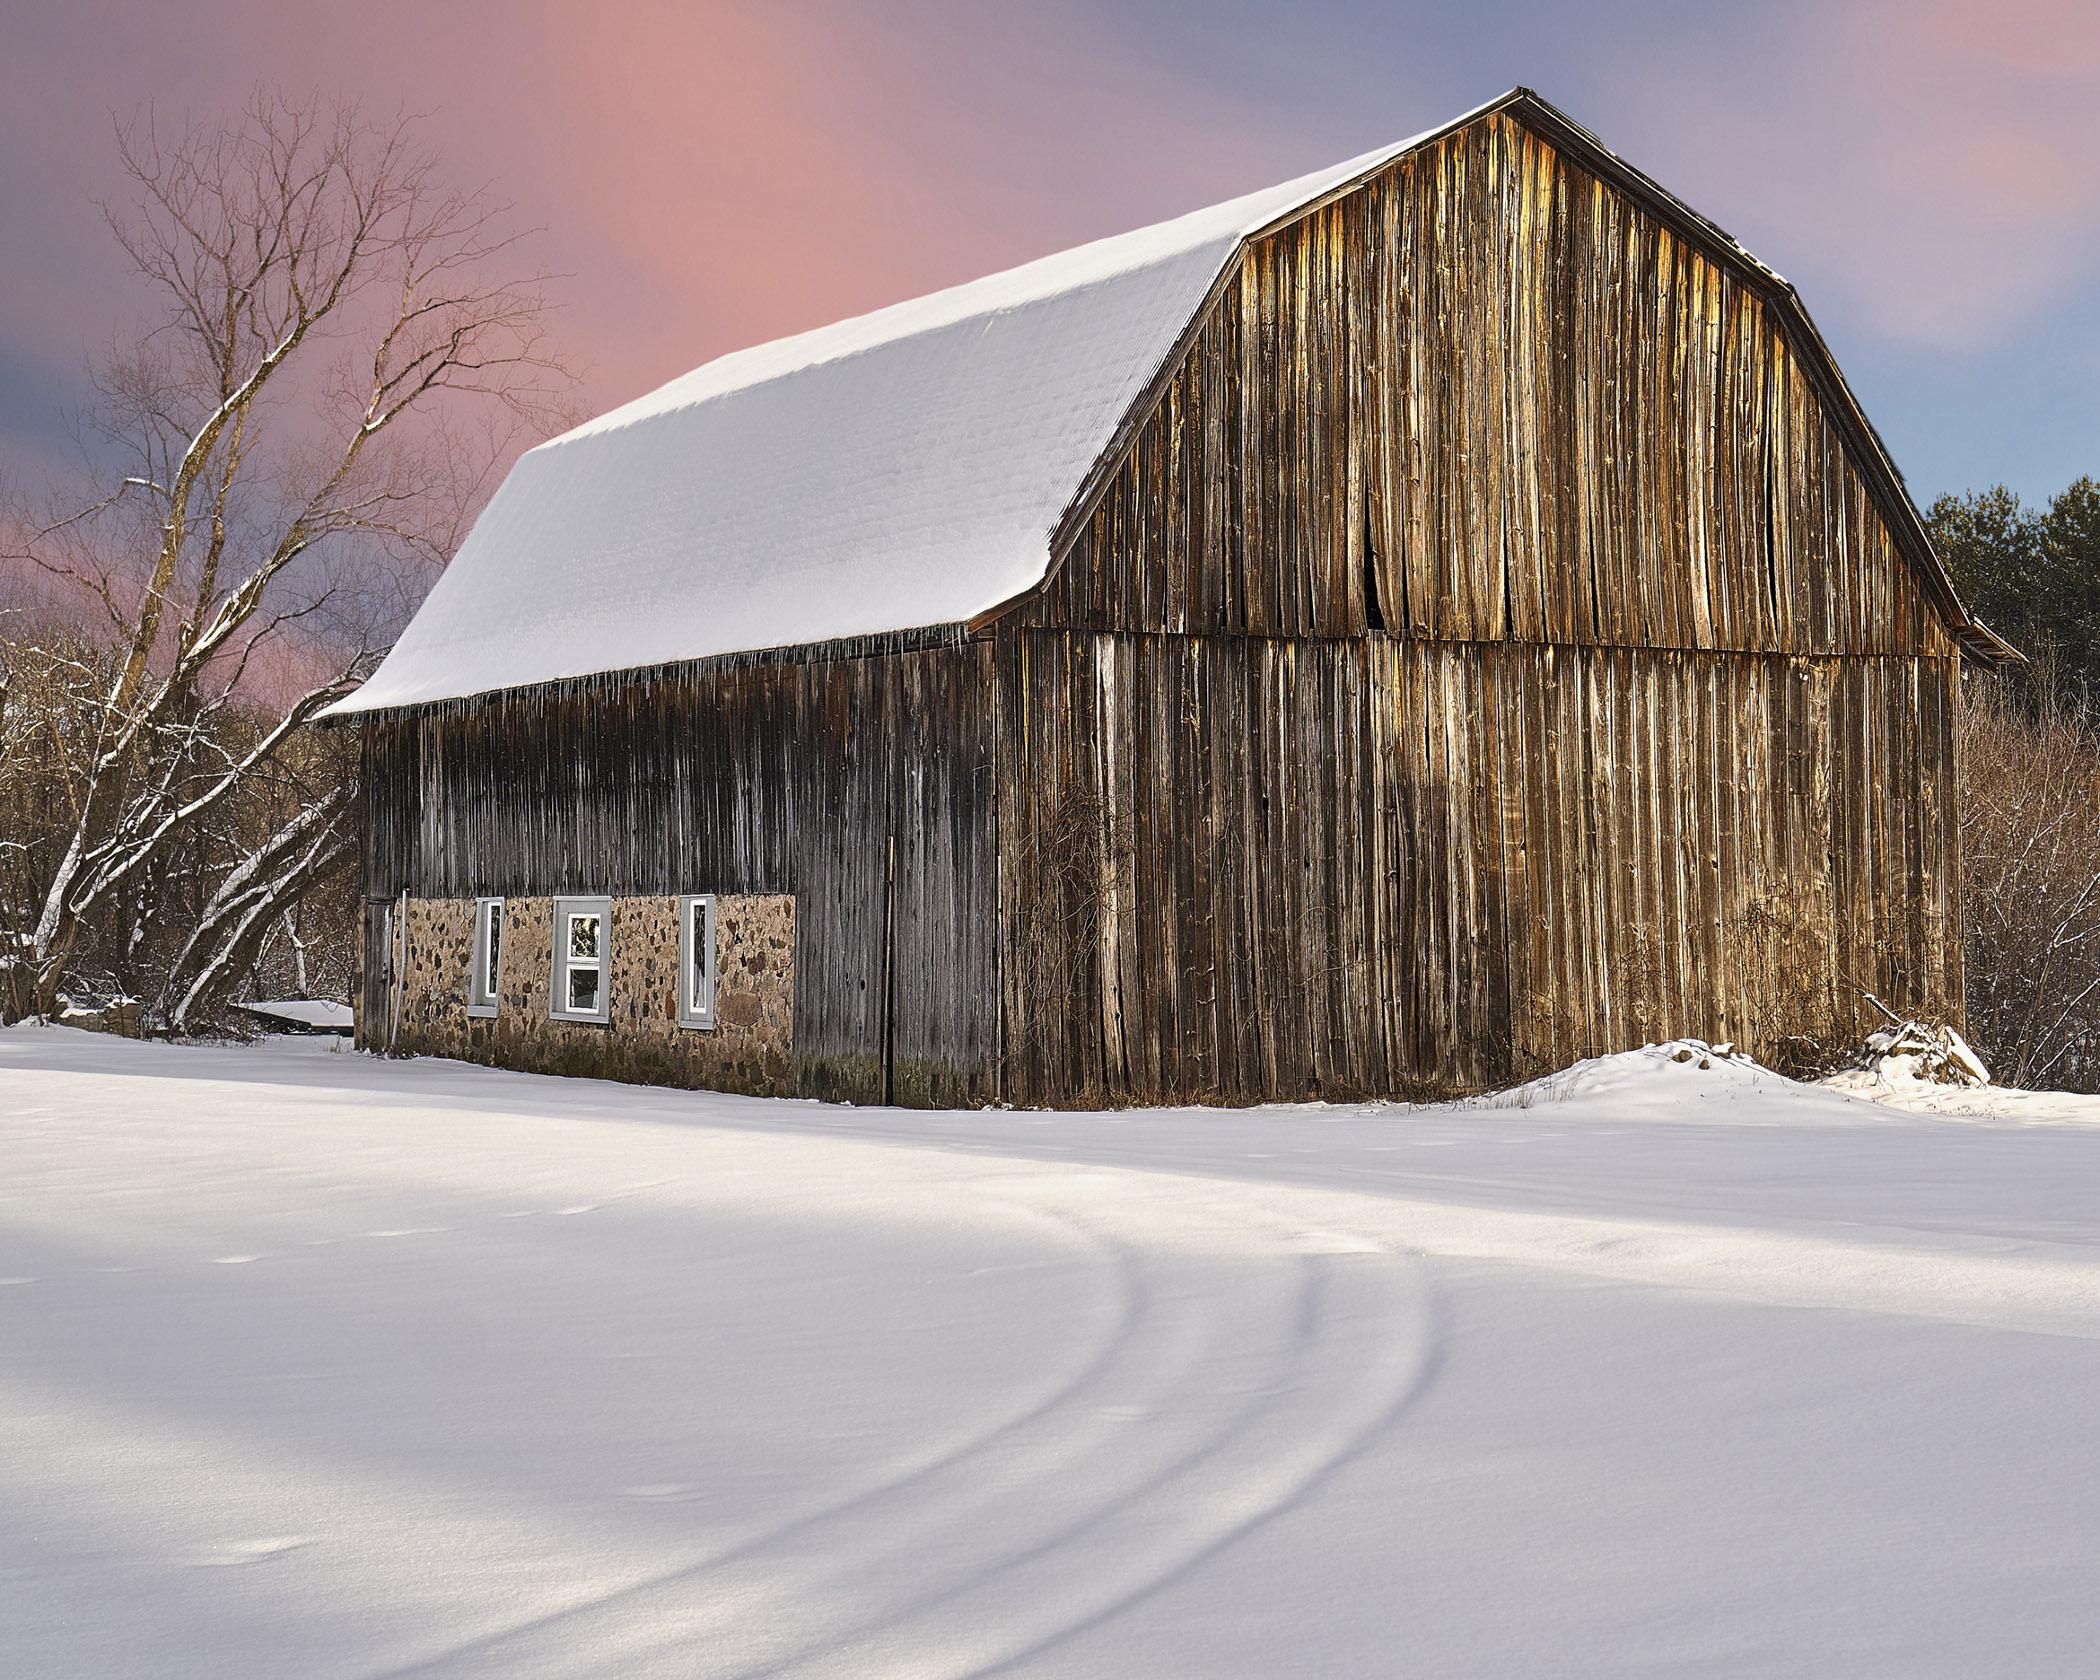 Late Afternoon Barn - Bob Crocker